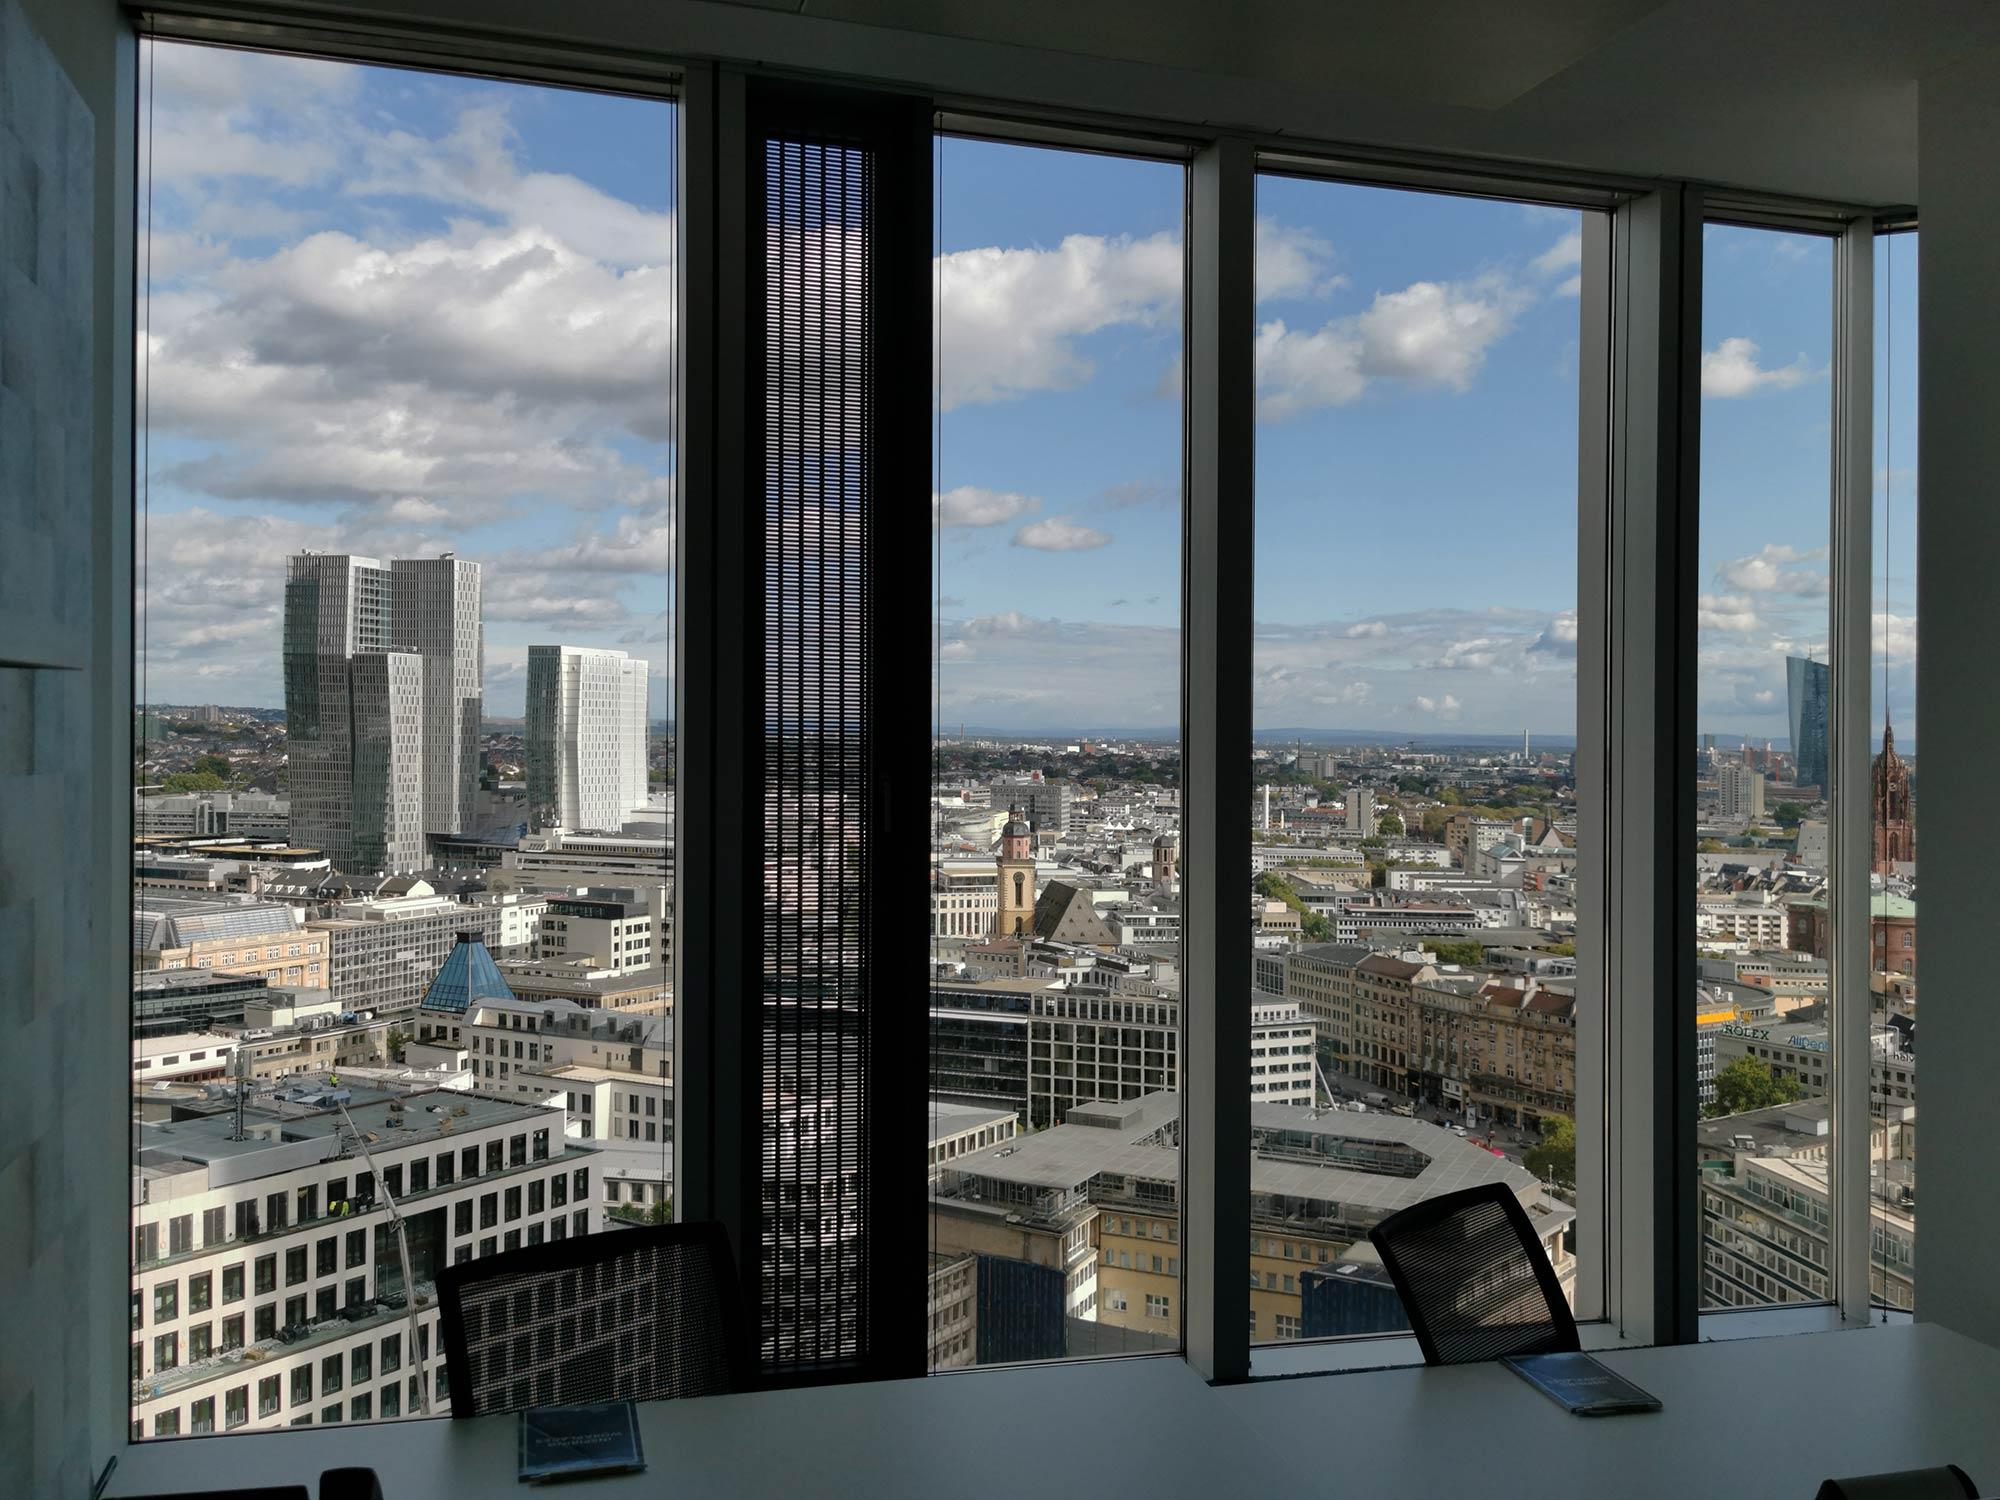 Coworking mit Skylineblick - Frankfurt Coworking Ausblick Skyline - Panorama Frankfurt - Tribes Garden Tower